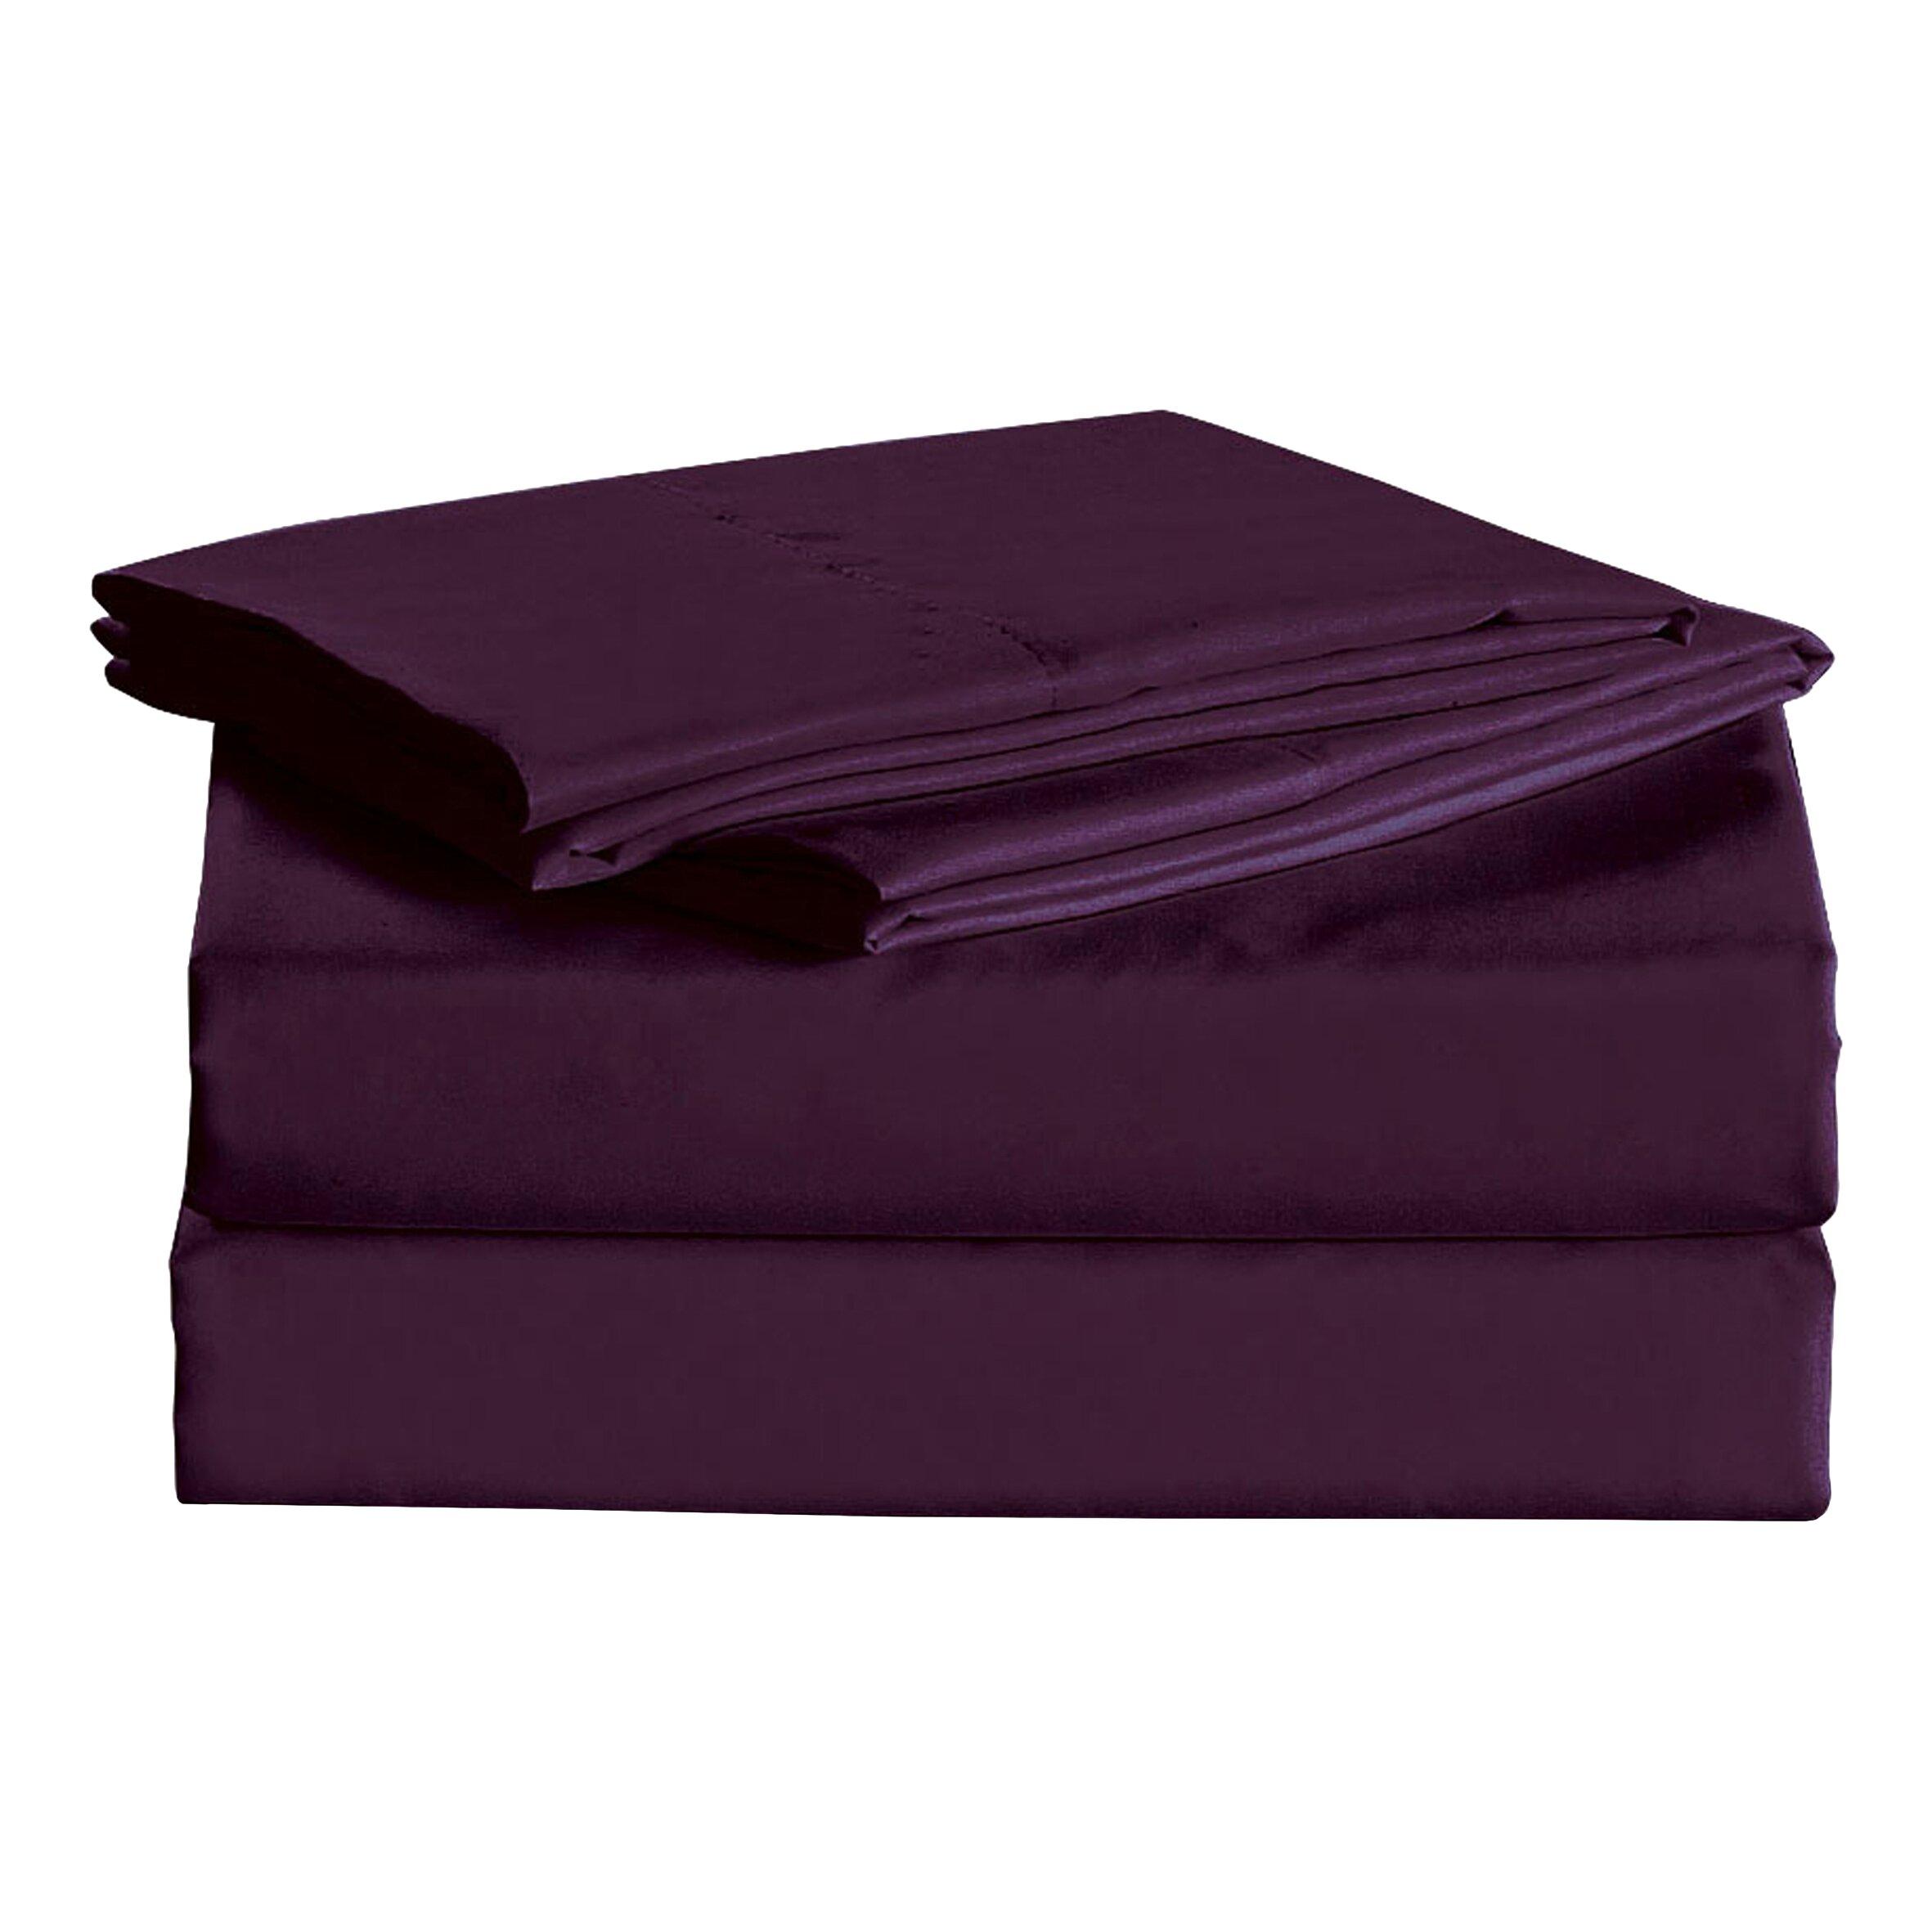 House of hampton macclesfield 1600 thread count sheet set for House of hampton bedding